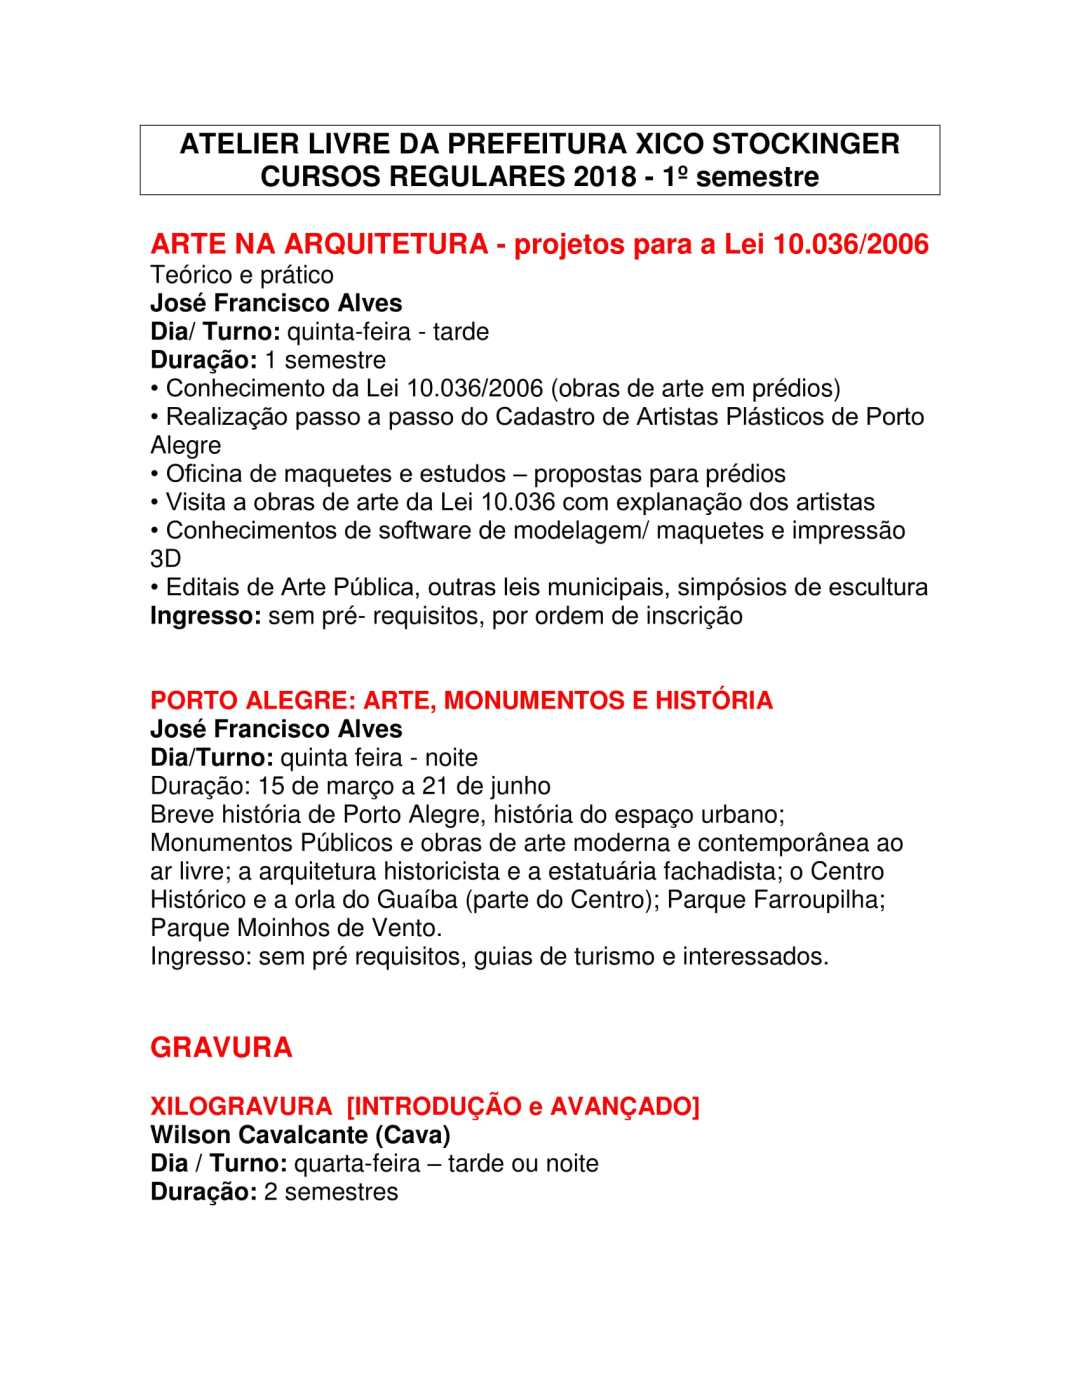 CURSOS REGULARES 2018 1 (1)-1